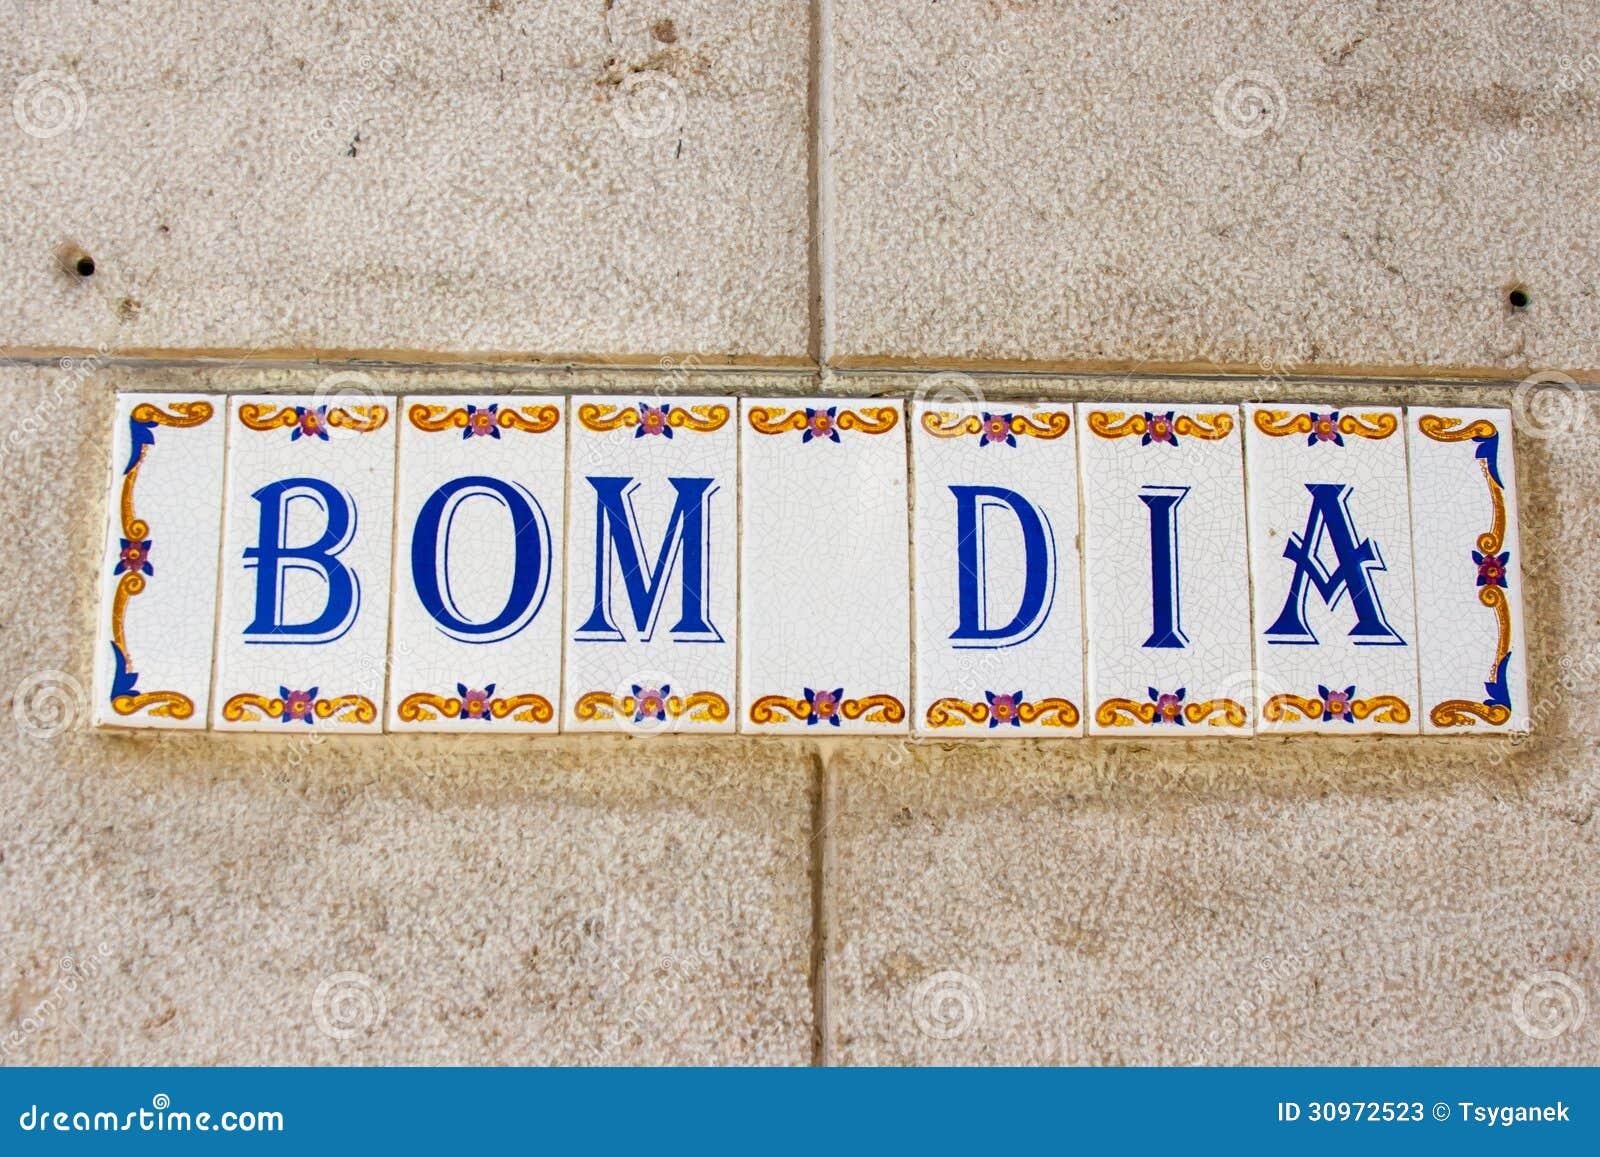 Bom Dia: Bom Dia (Good Morning) Tiles On A Building In Lisbon Stock